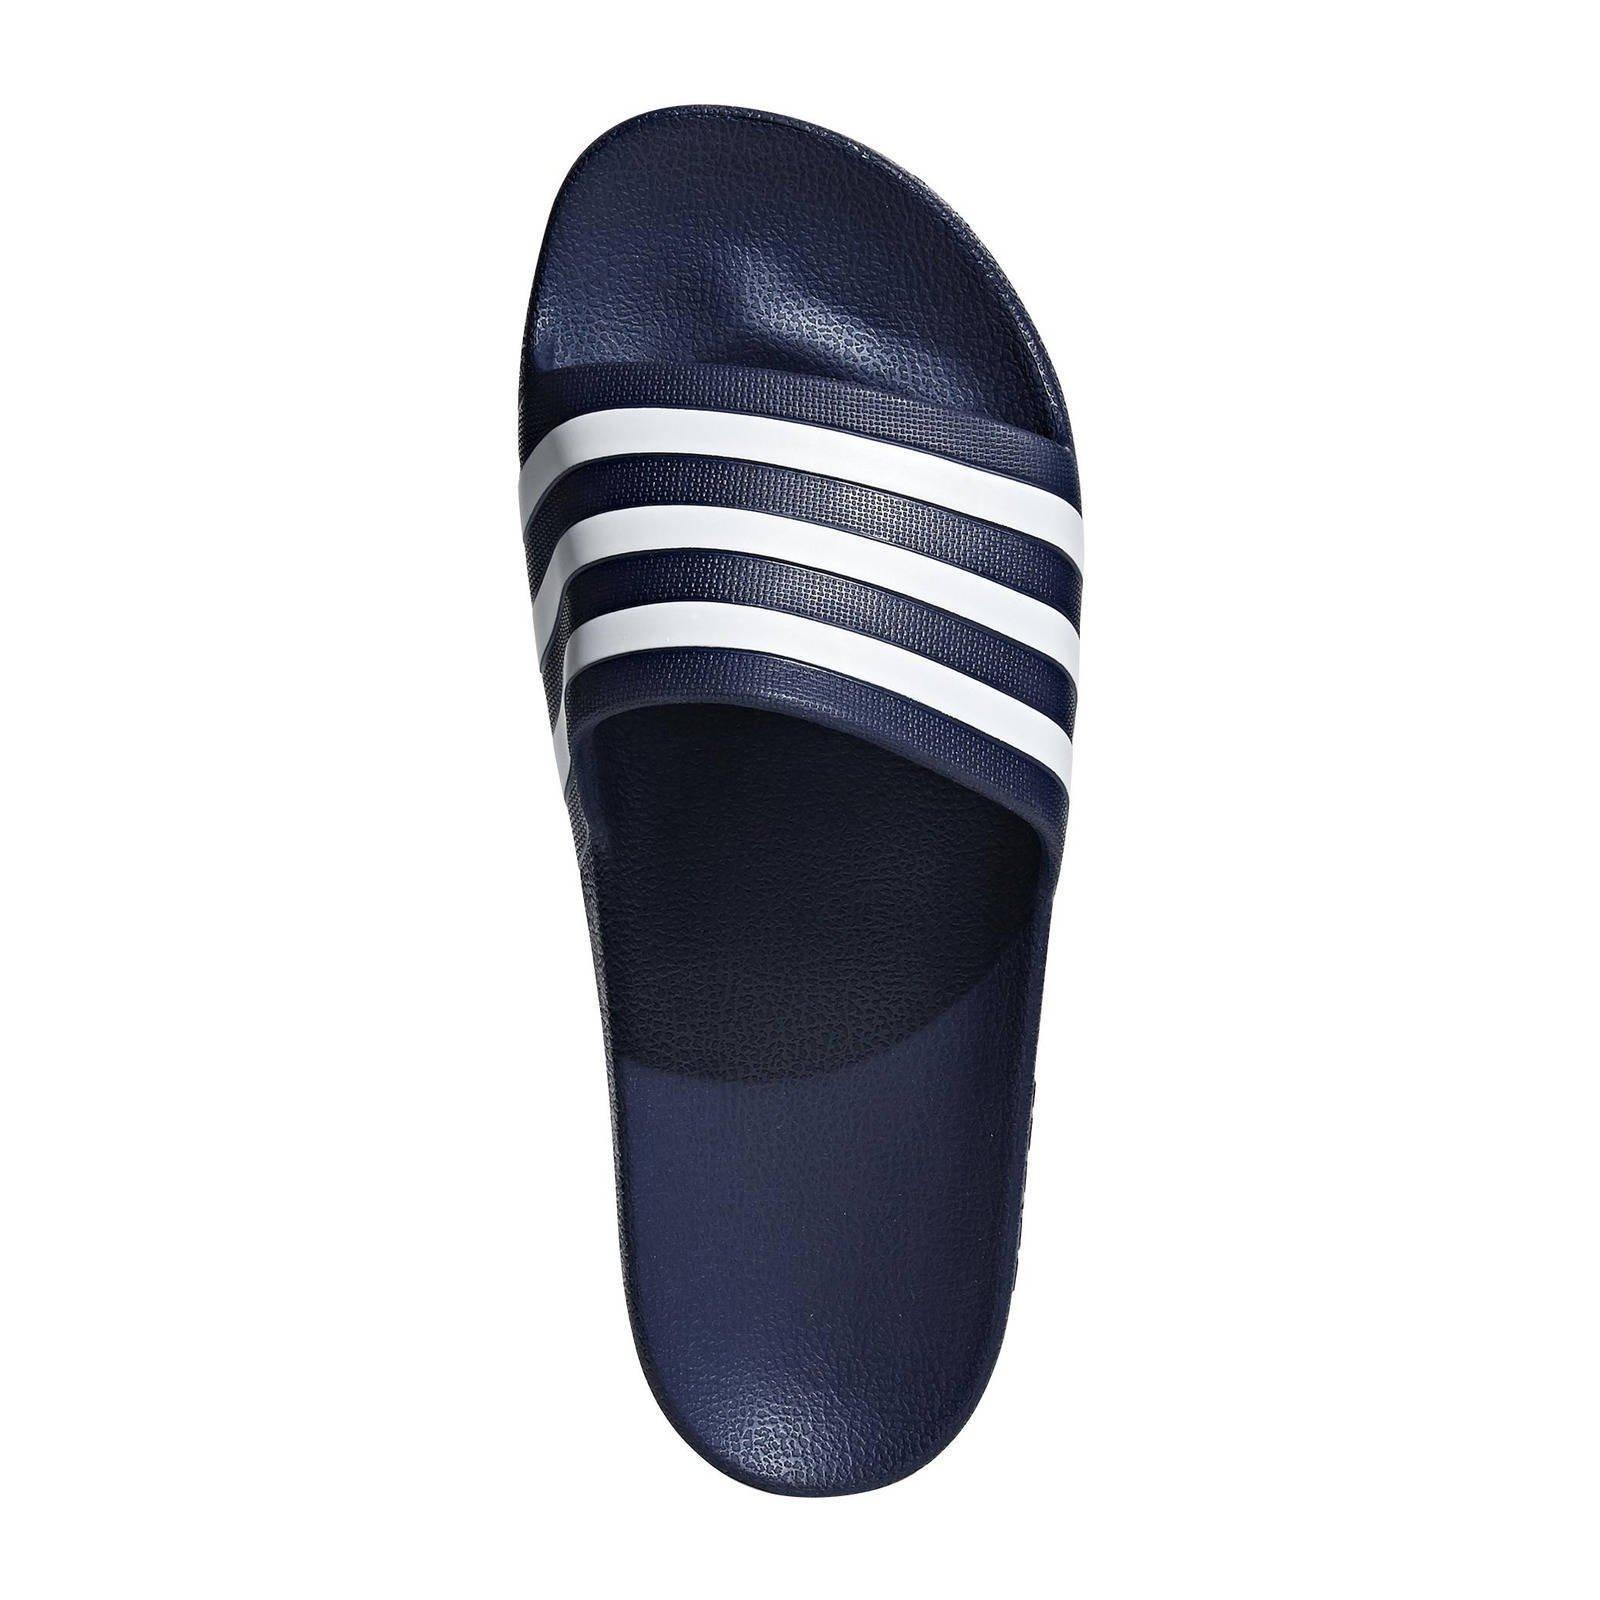 1d26ad55f90 adidas performance Adilette Aqua badslippers donkerblauw | wehkamp